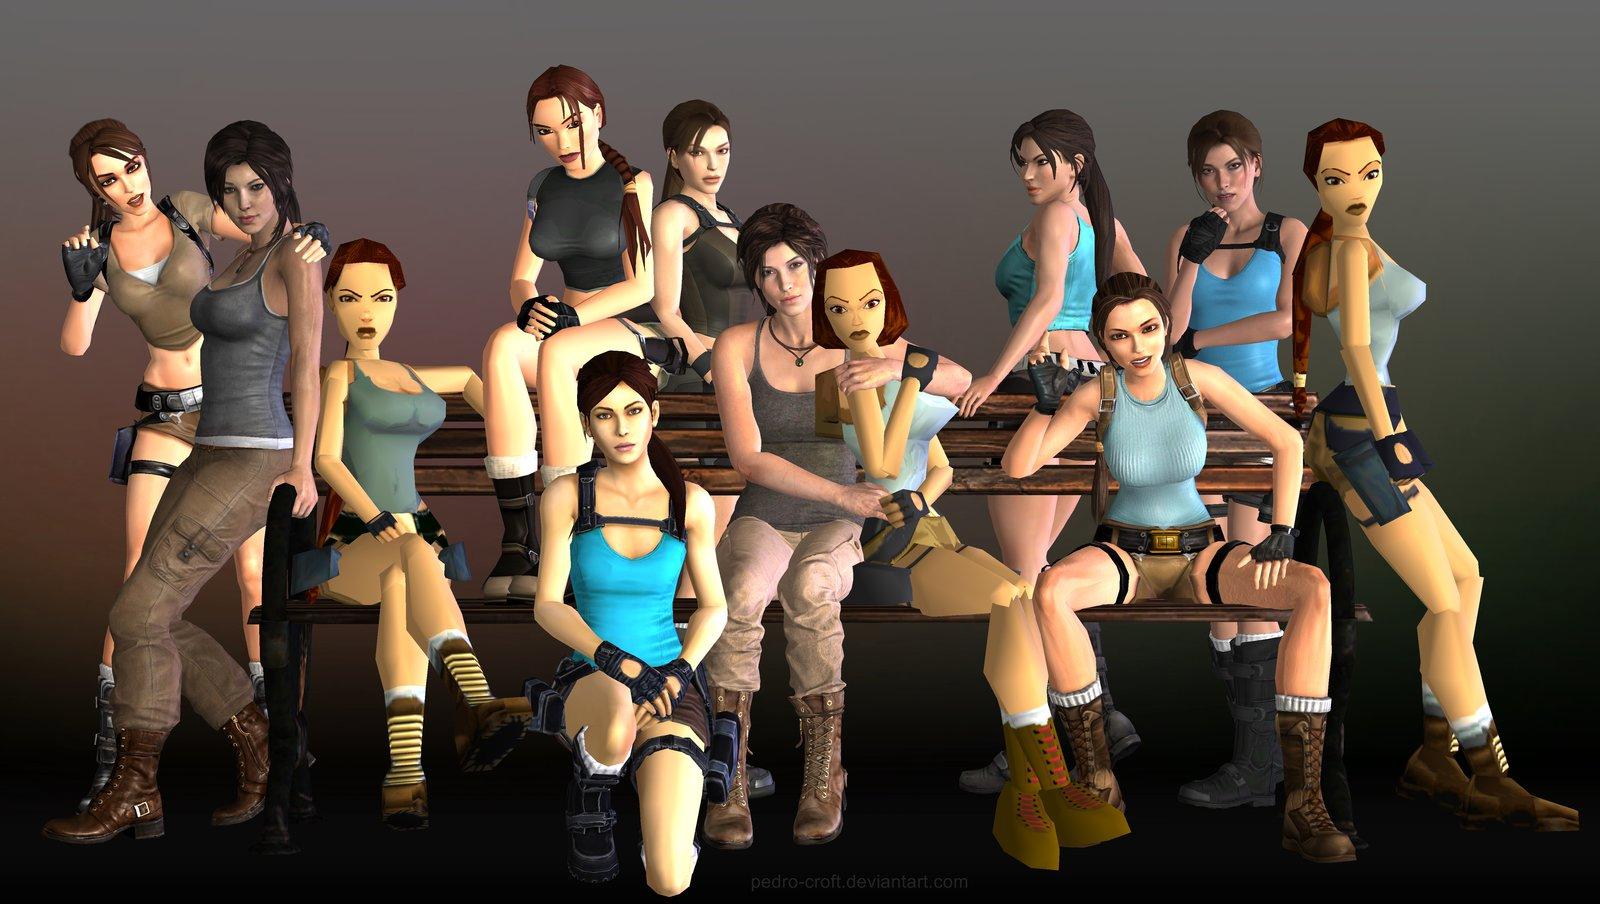 Tomb raider game 3gp sex video adult scene